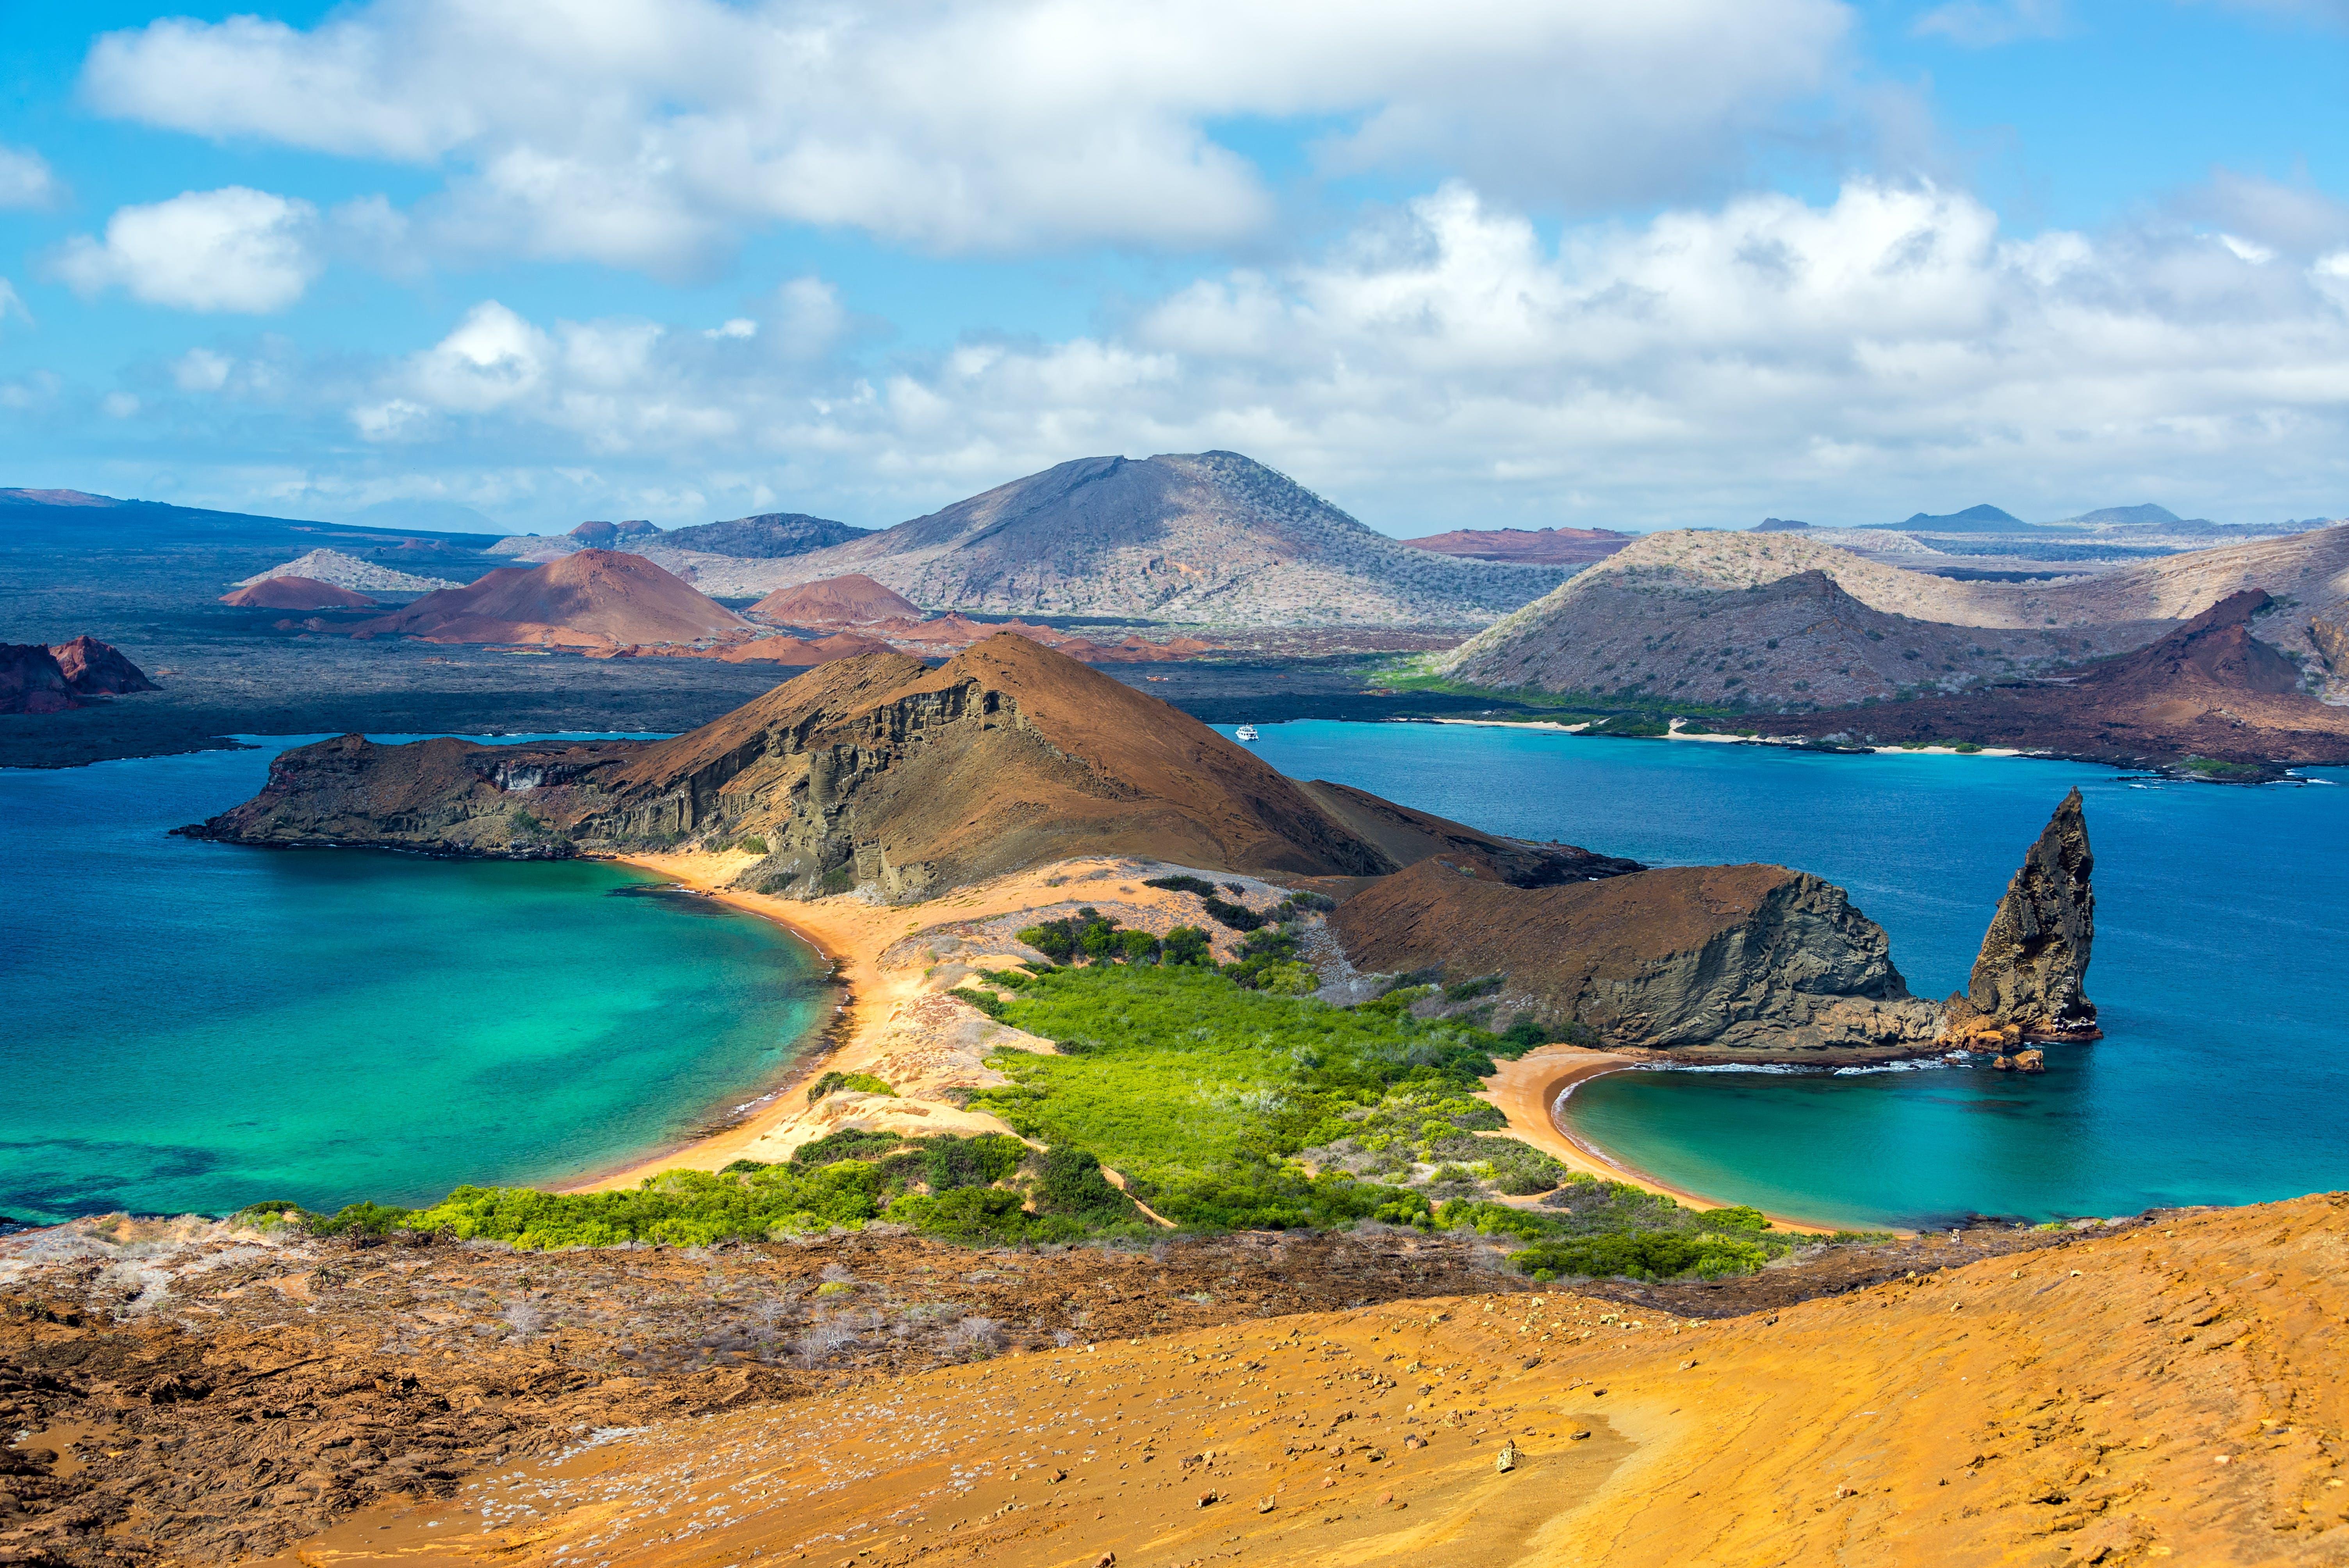 Galapagos Islands aerial